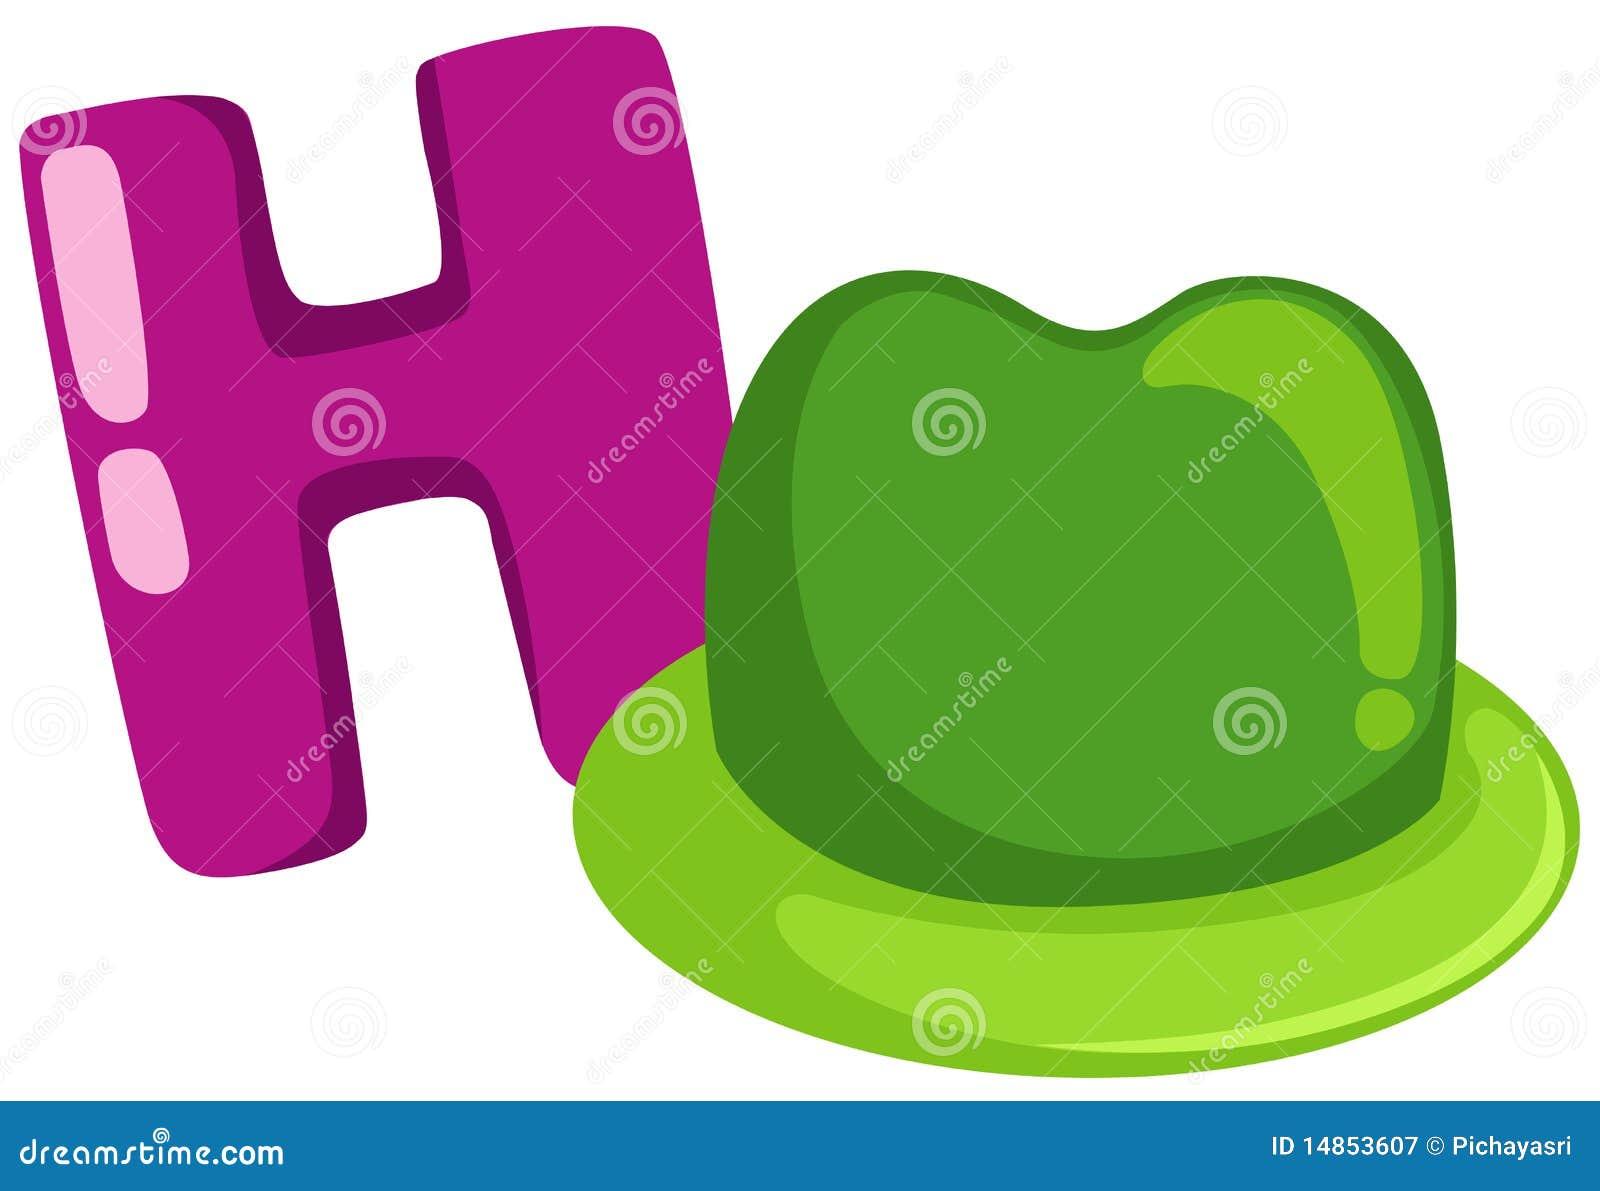 alphabet h for hat